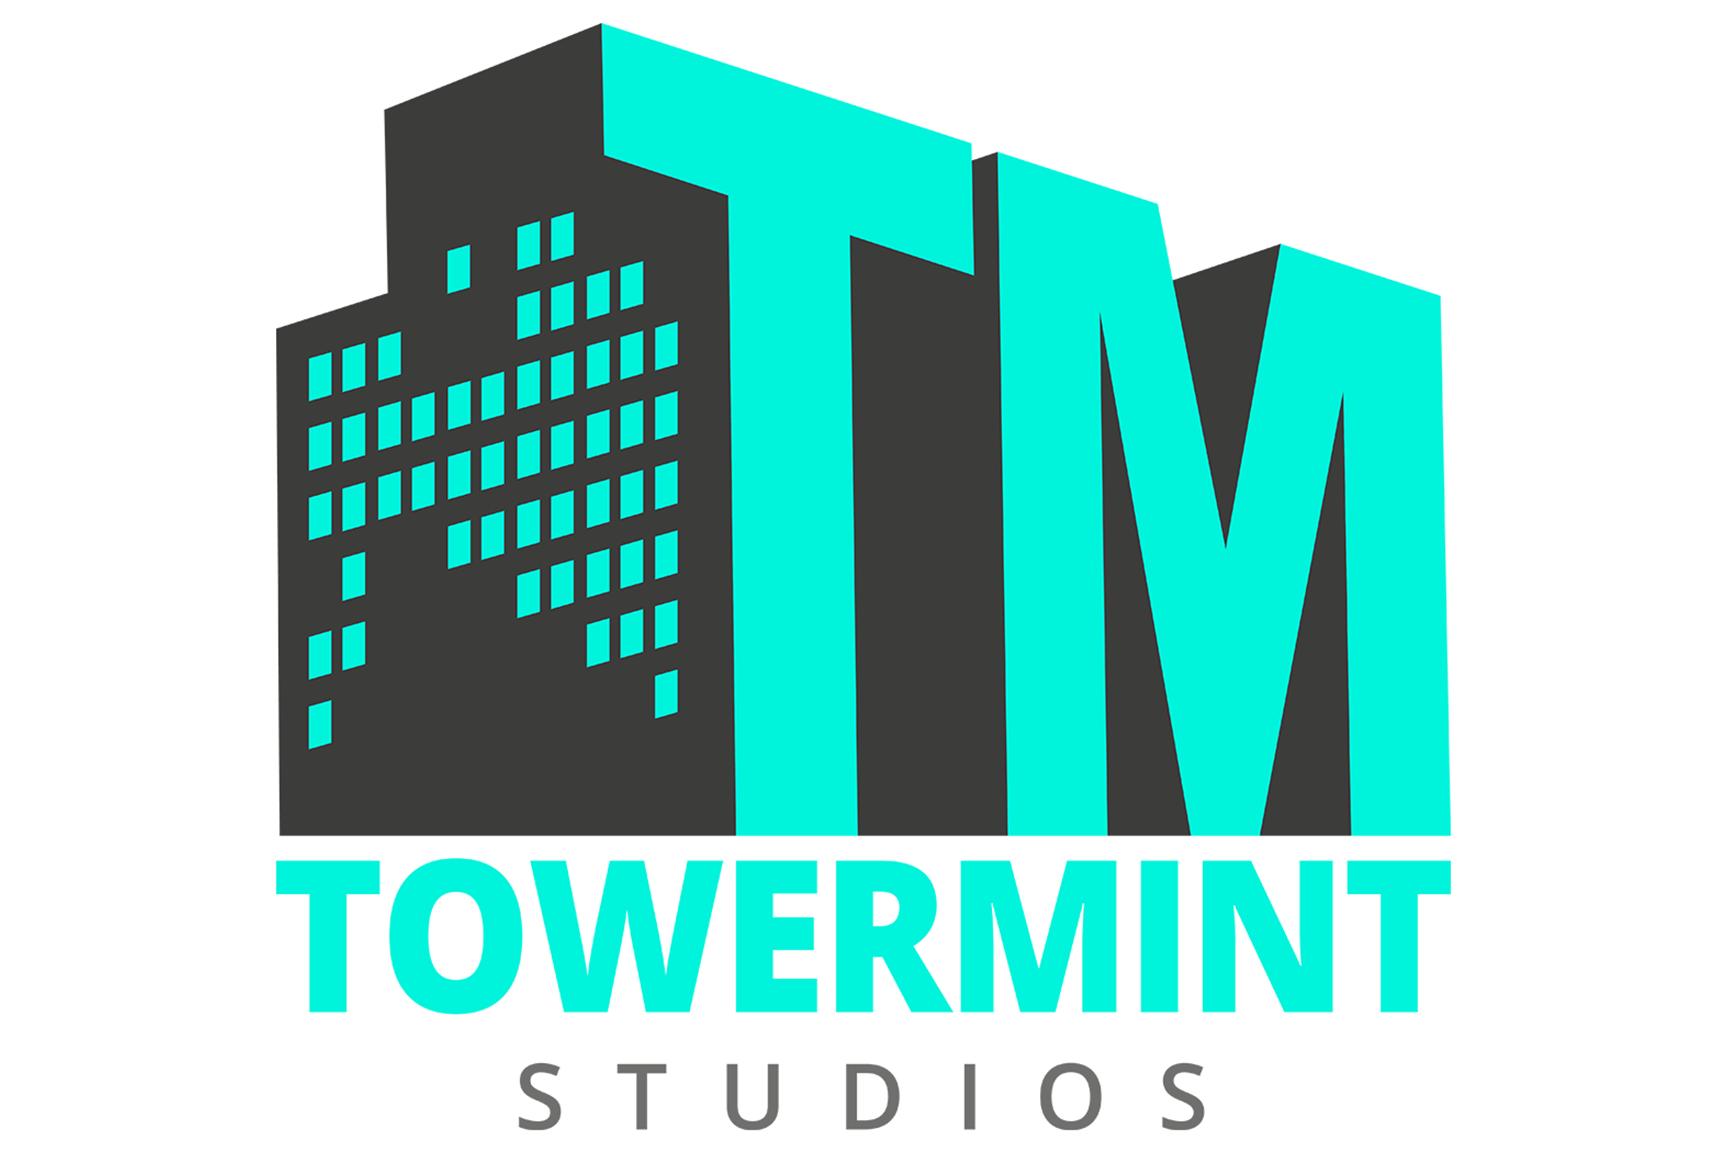 Towermint Studios